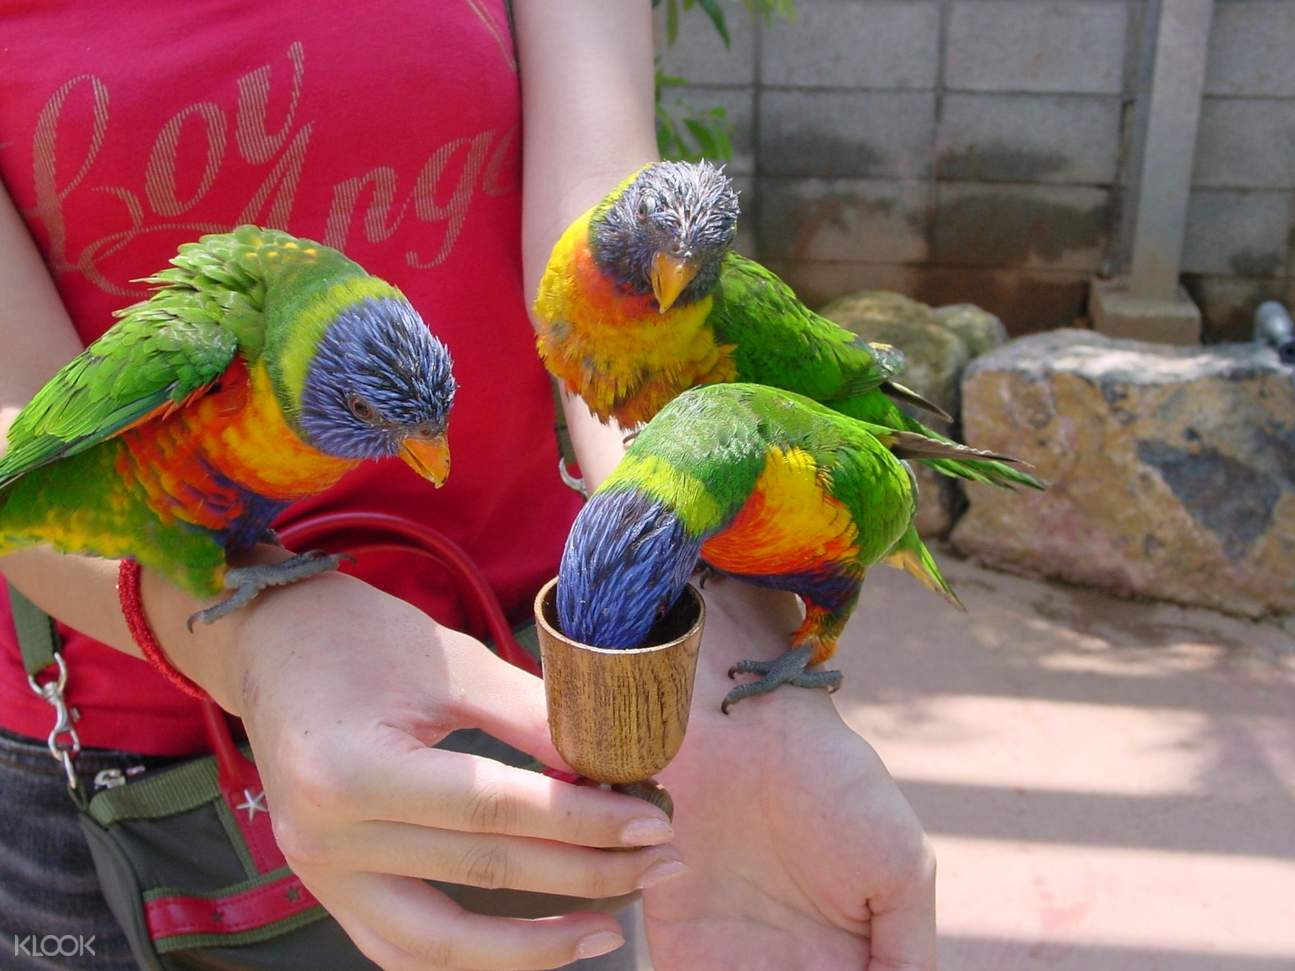 birds in okinawa fruits land